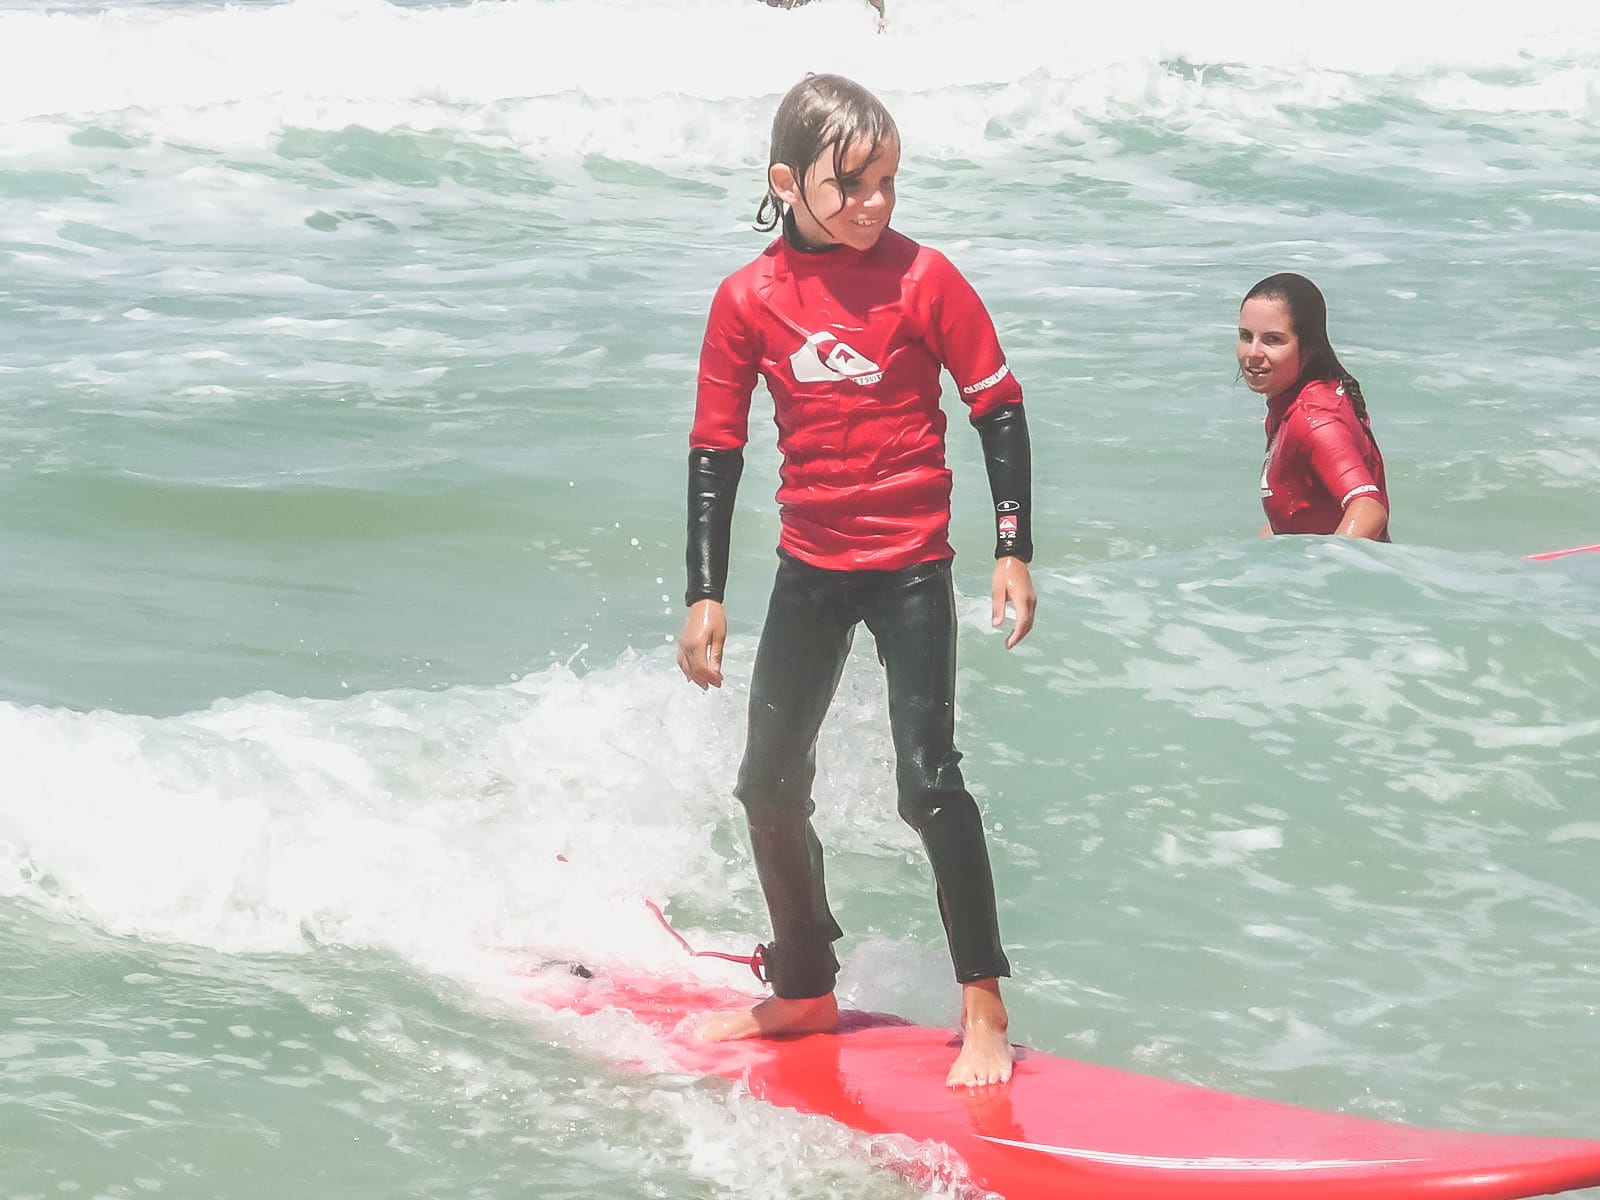 surf cours particulier